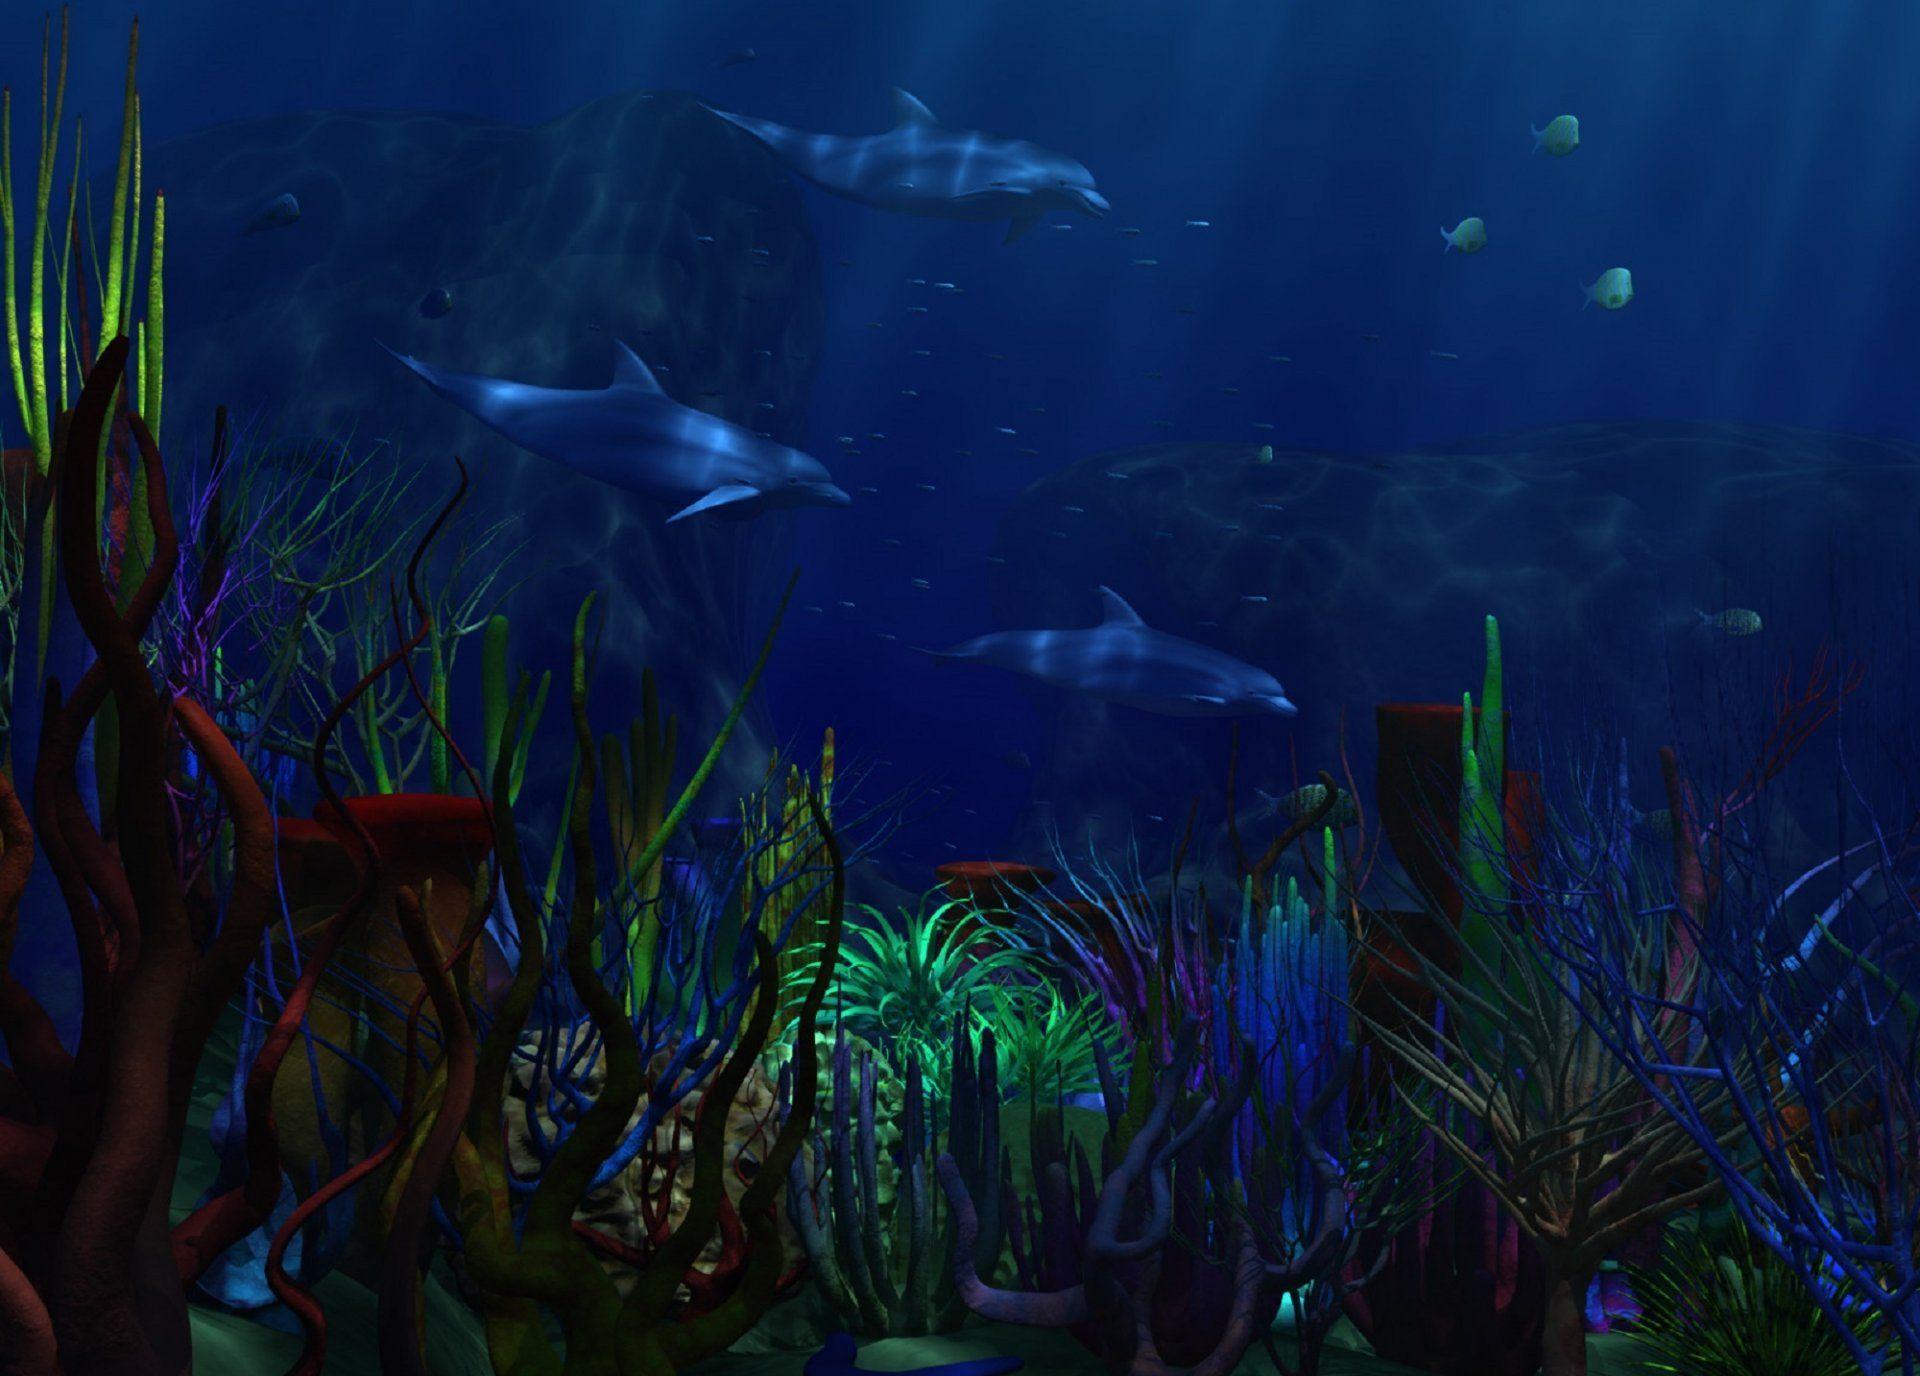 Underwater world sea dolphins algae corals dark blue background underwater underwater world sea dolphins algae corals publicscrutiny Images